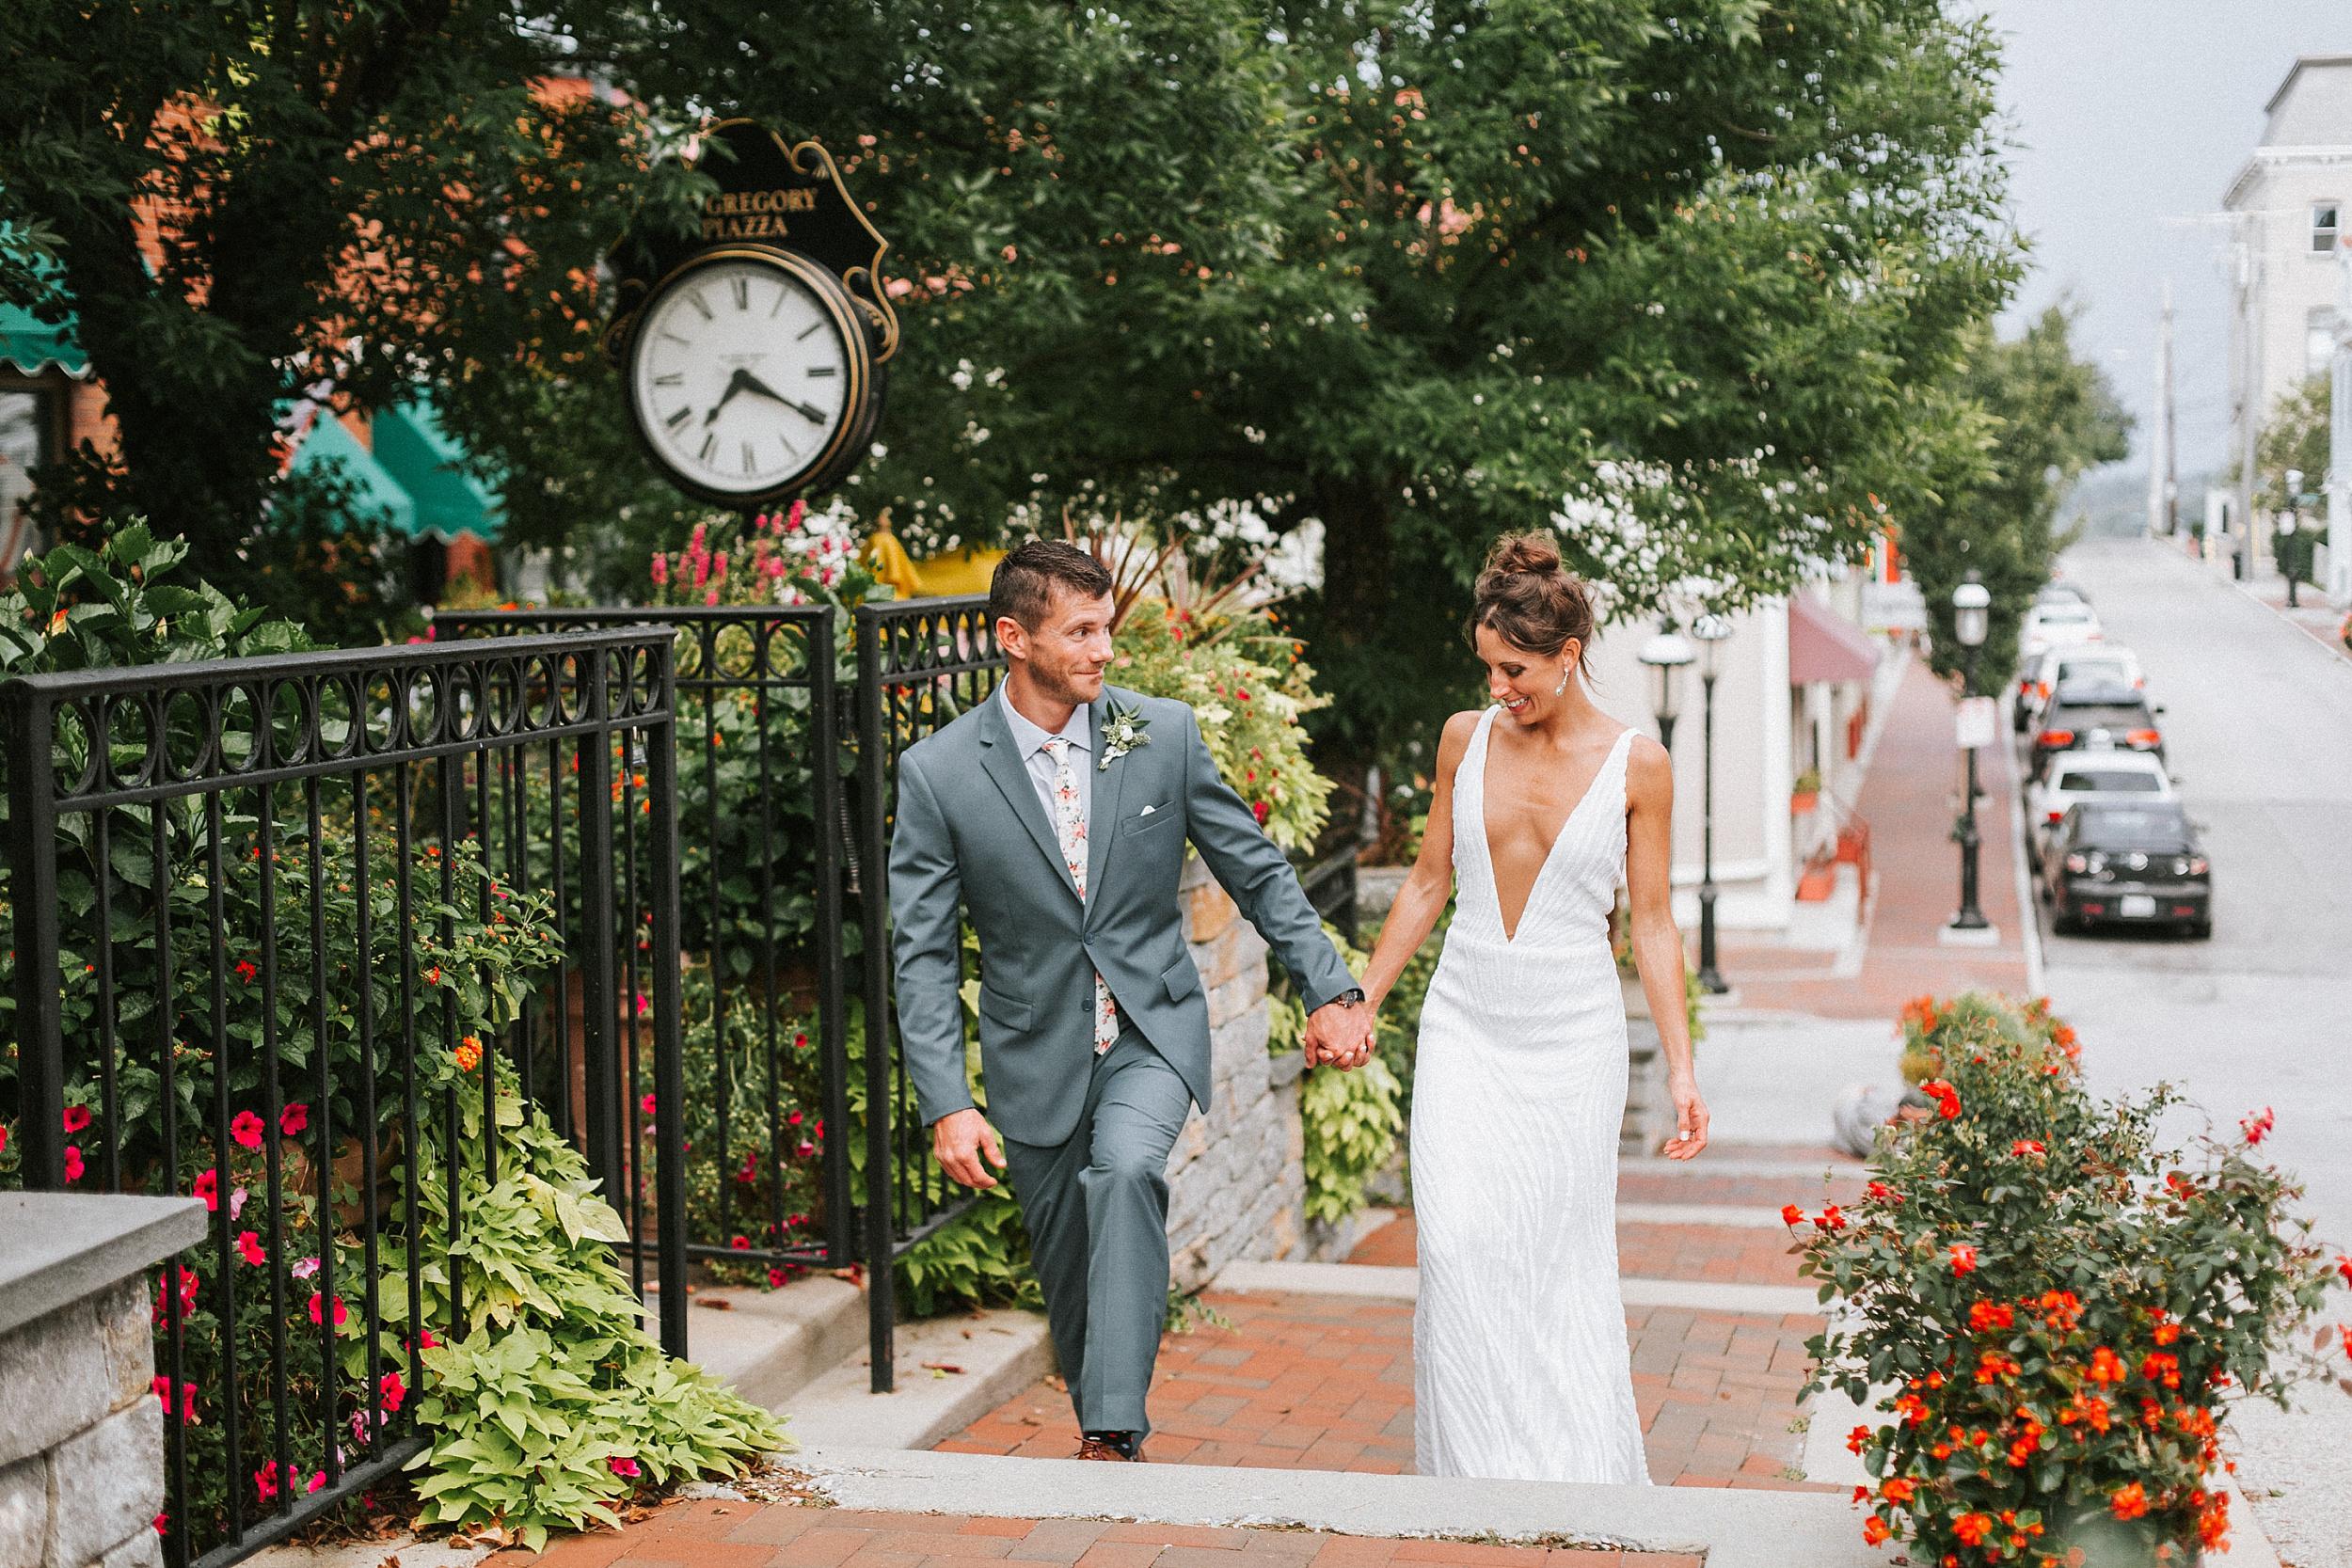 Brooke Townsend Photography - Cincinnati Wedding Photographer (138 of 170).jpg